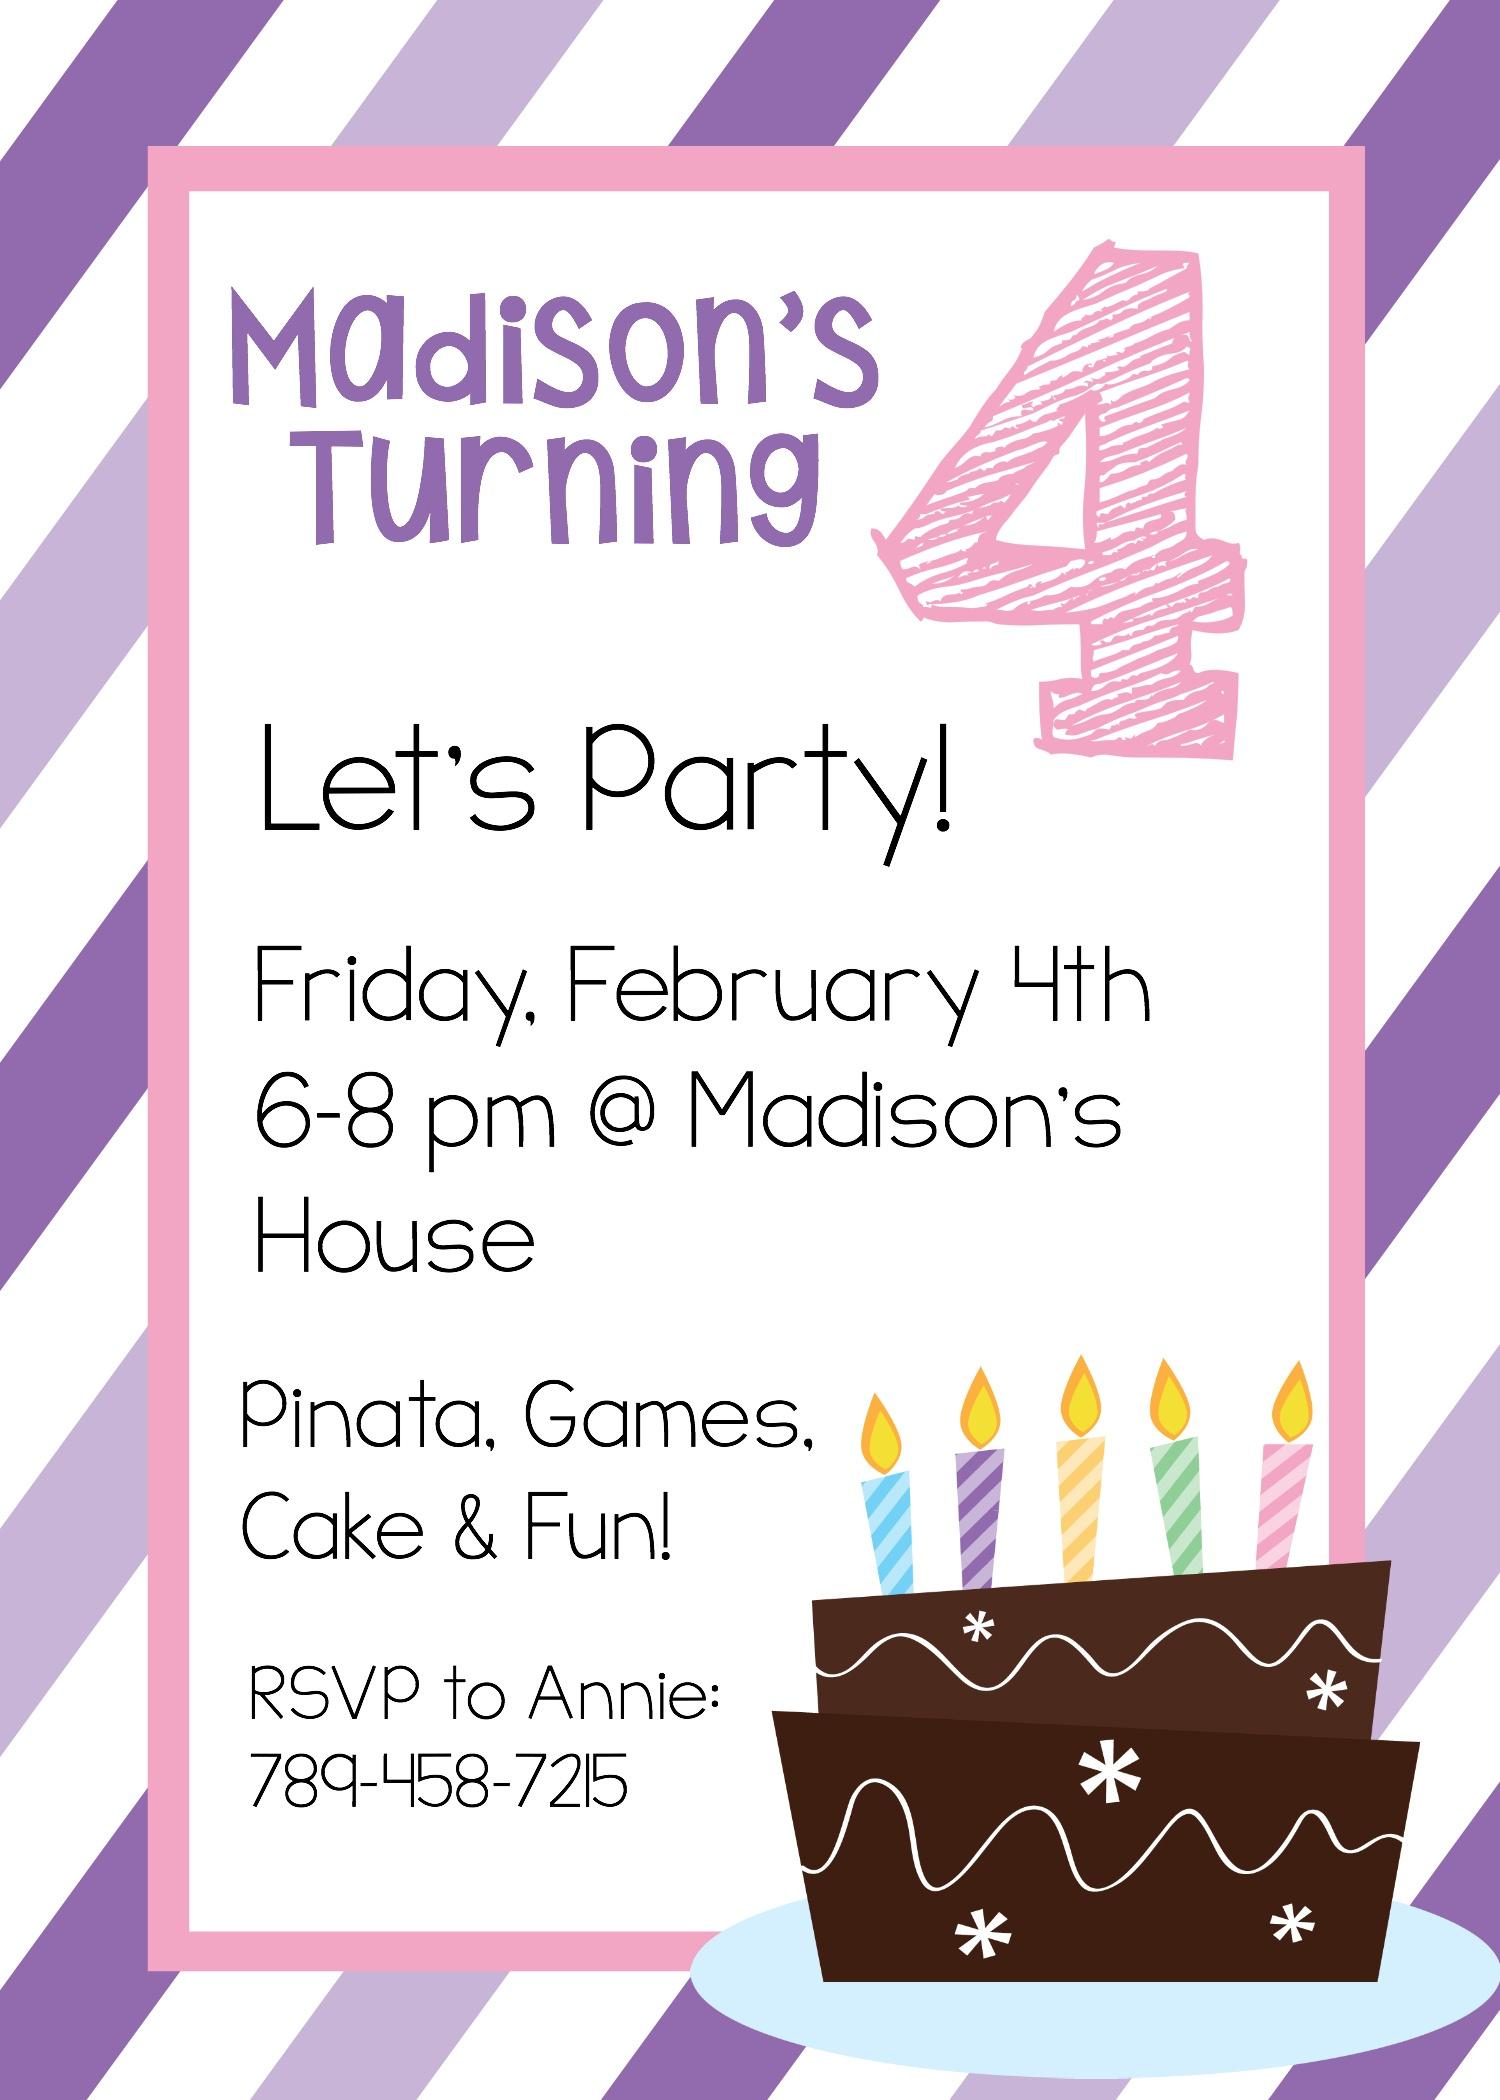 Girls Birthday Party Invitations Templates - Tutlin.psstech.co - Free Printable Girl Birthday Party Invitations